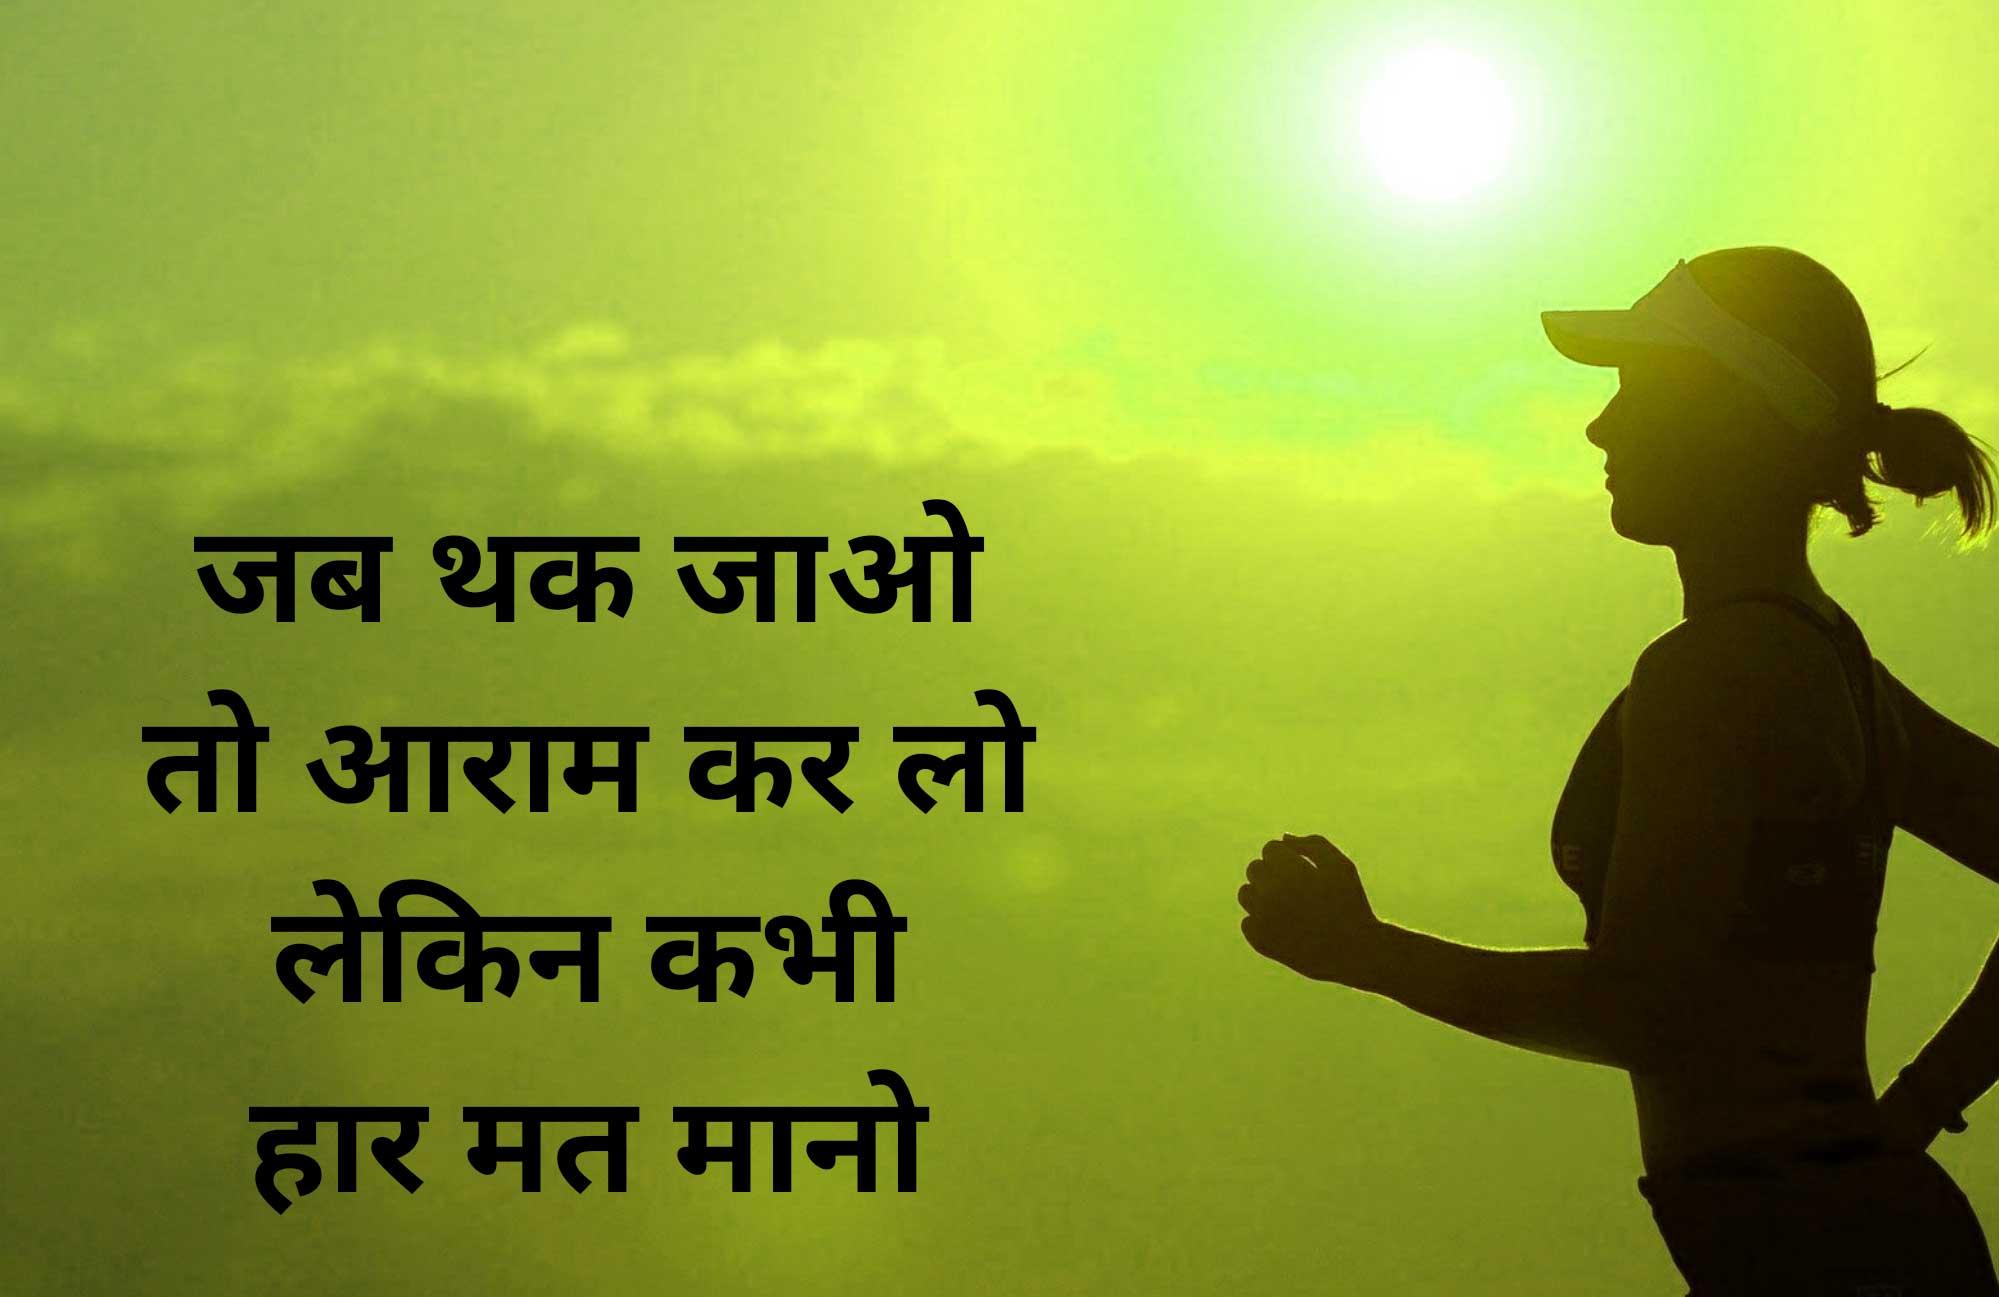 New Hindi Whatsapp Status Images Download